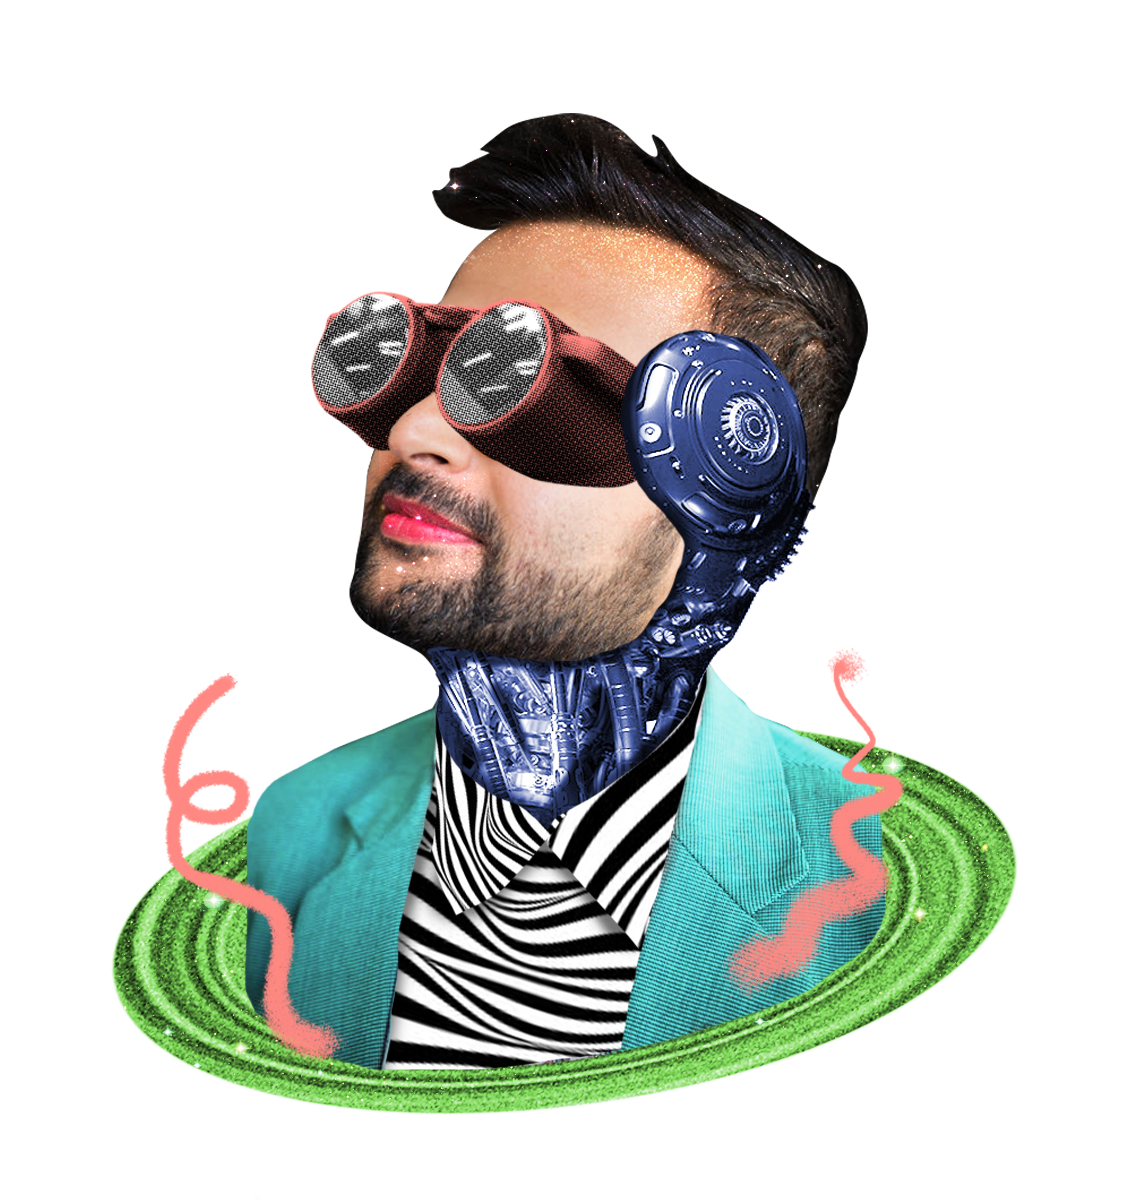 Augmented portrait of fahad punjwani